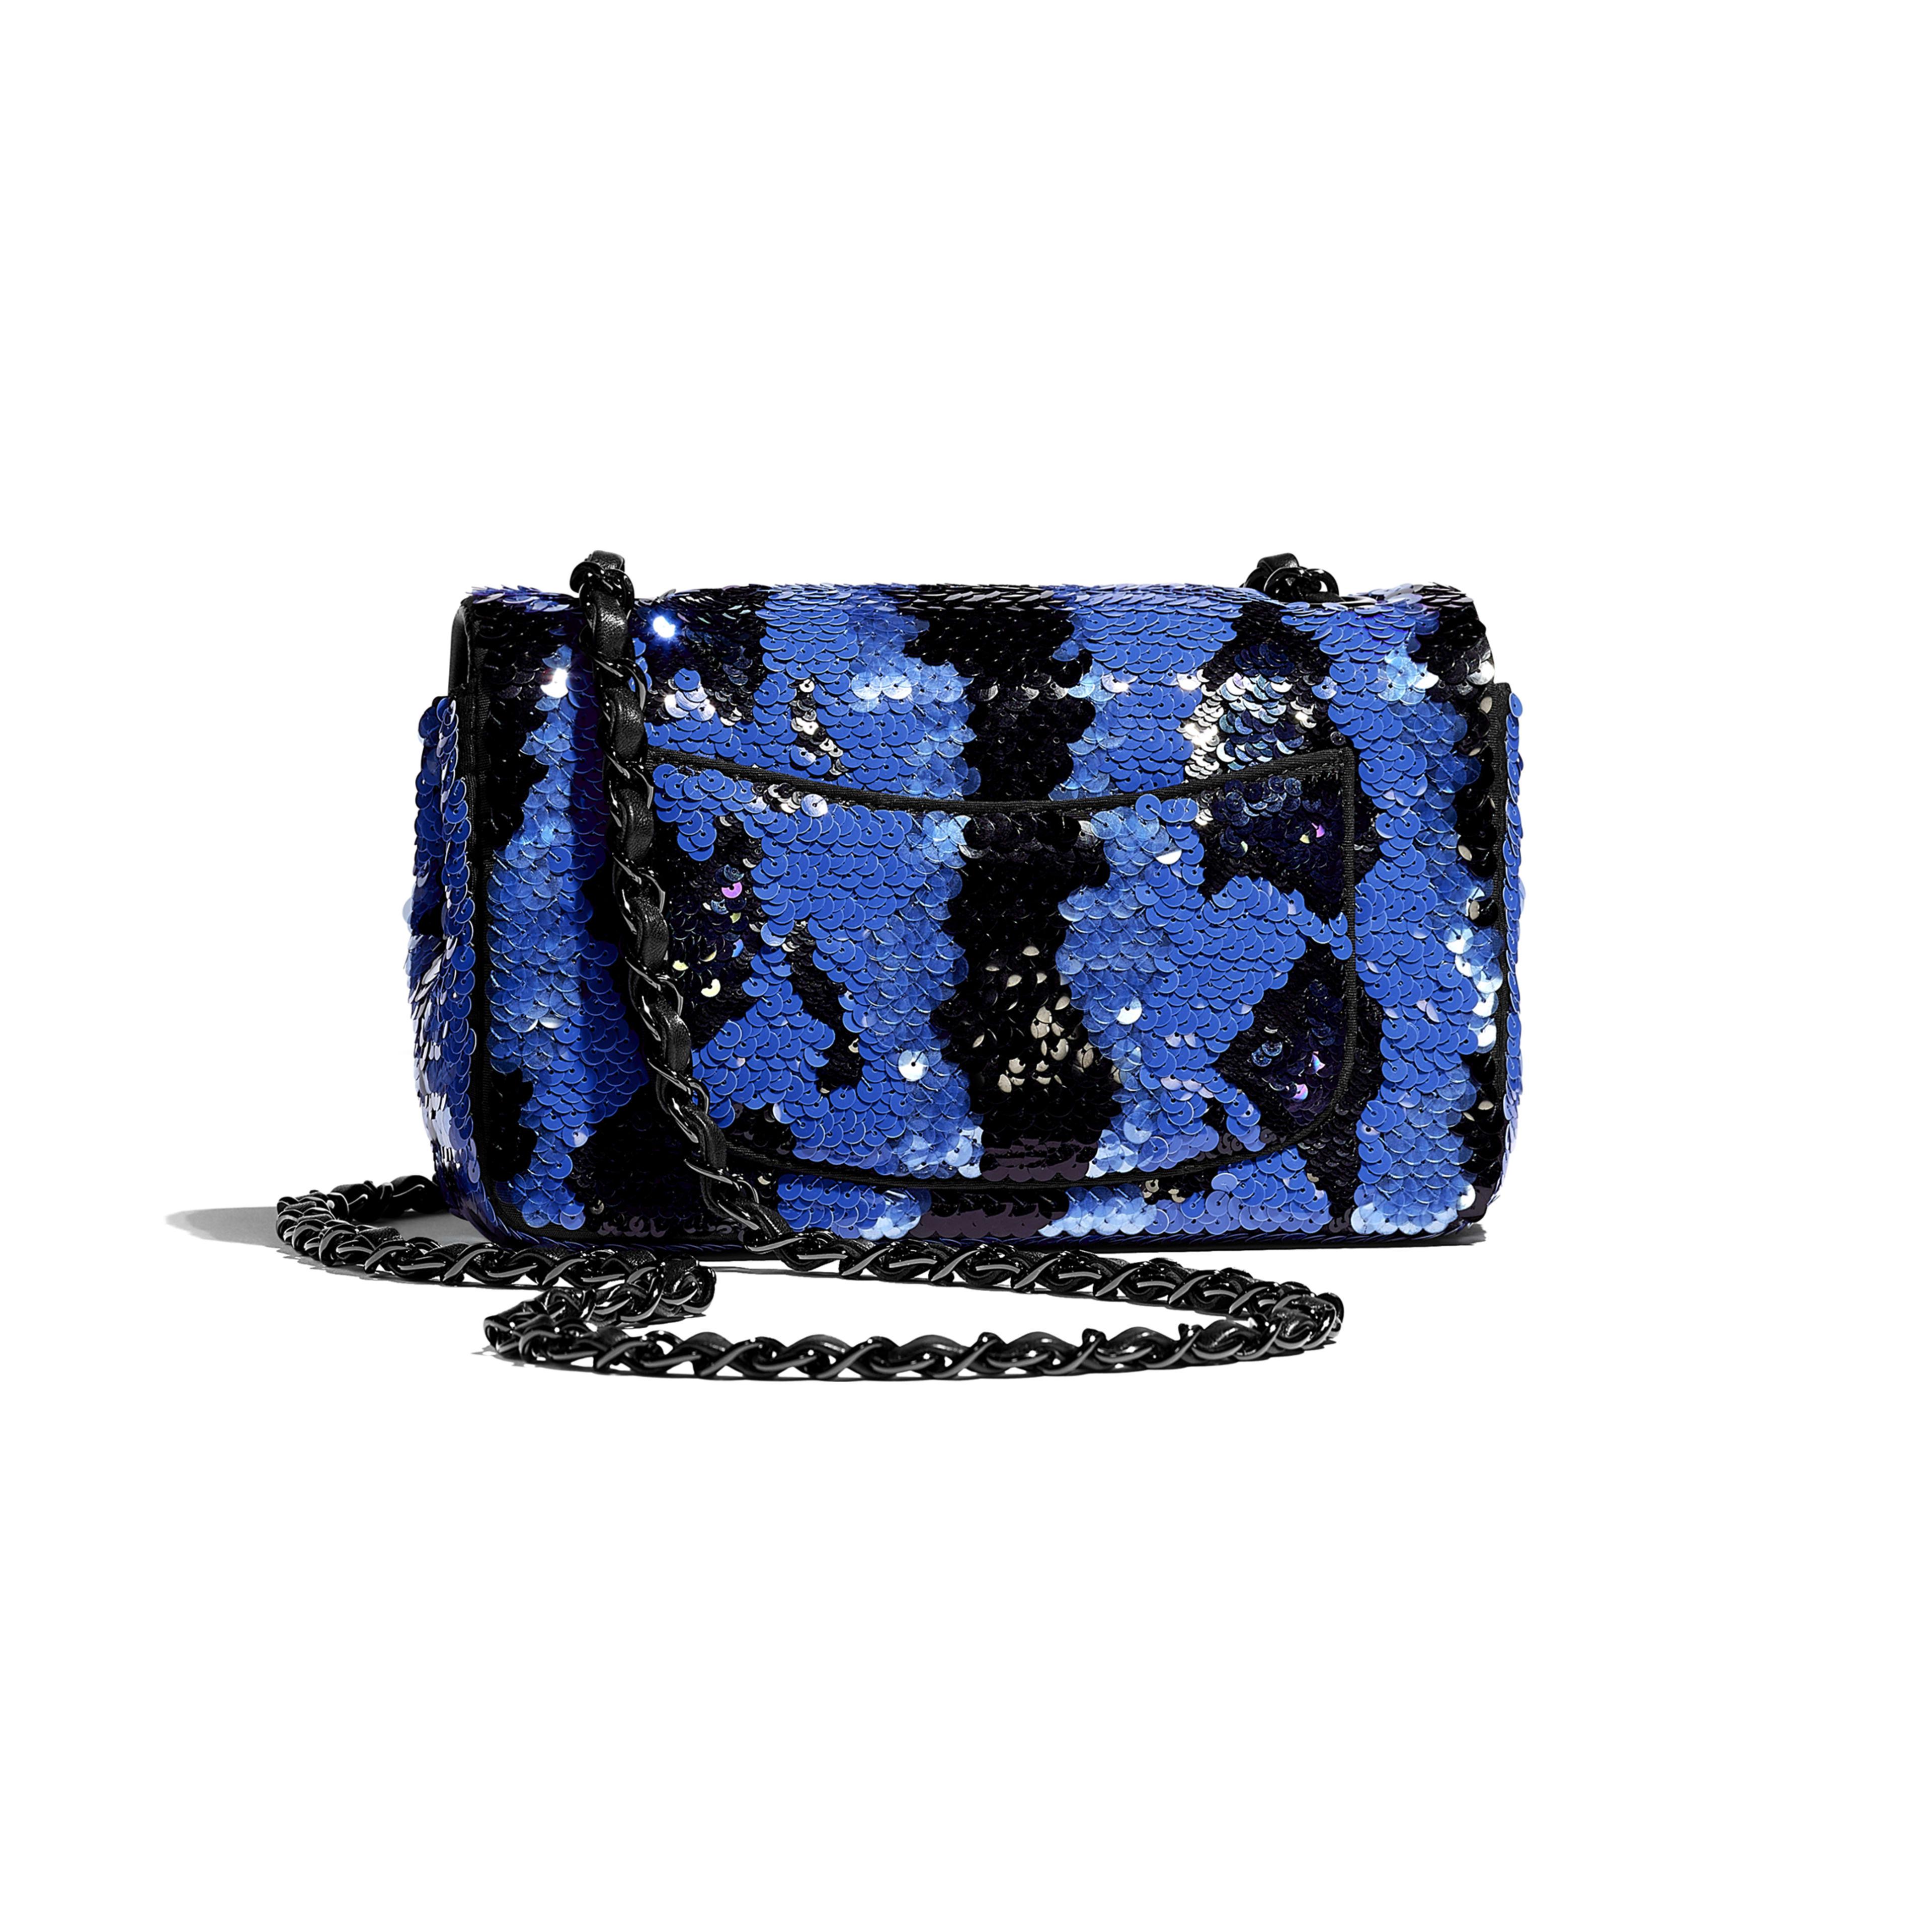 Mini Flap Bag - Blue & Black - Sequins & Black Metal - Alternative view - see full sized version